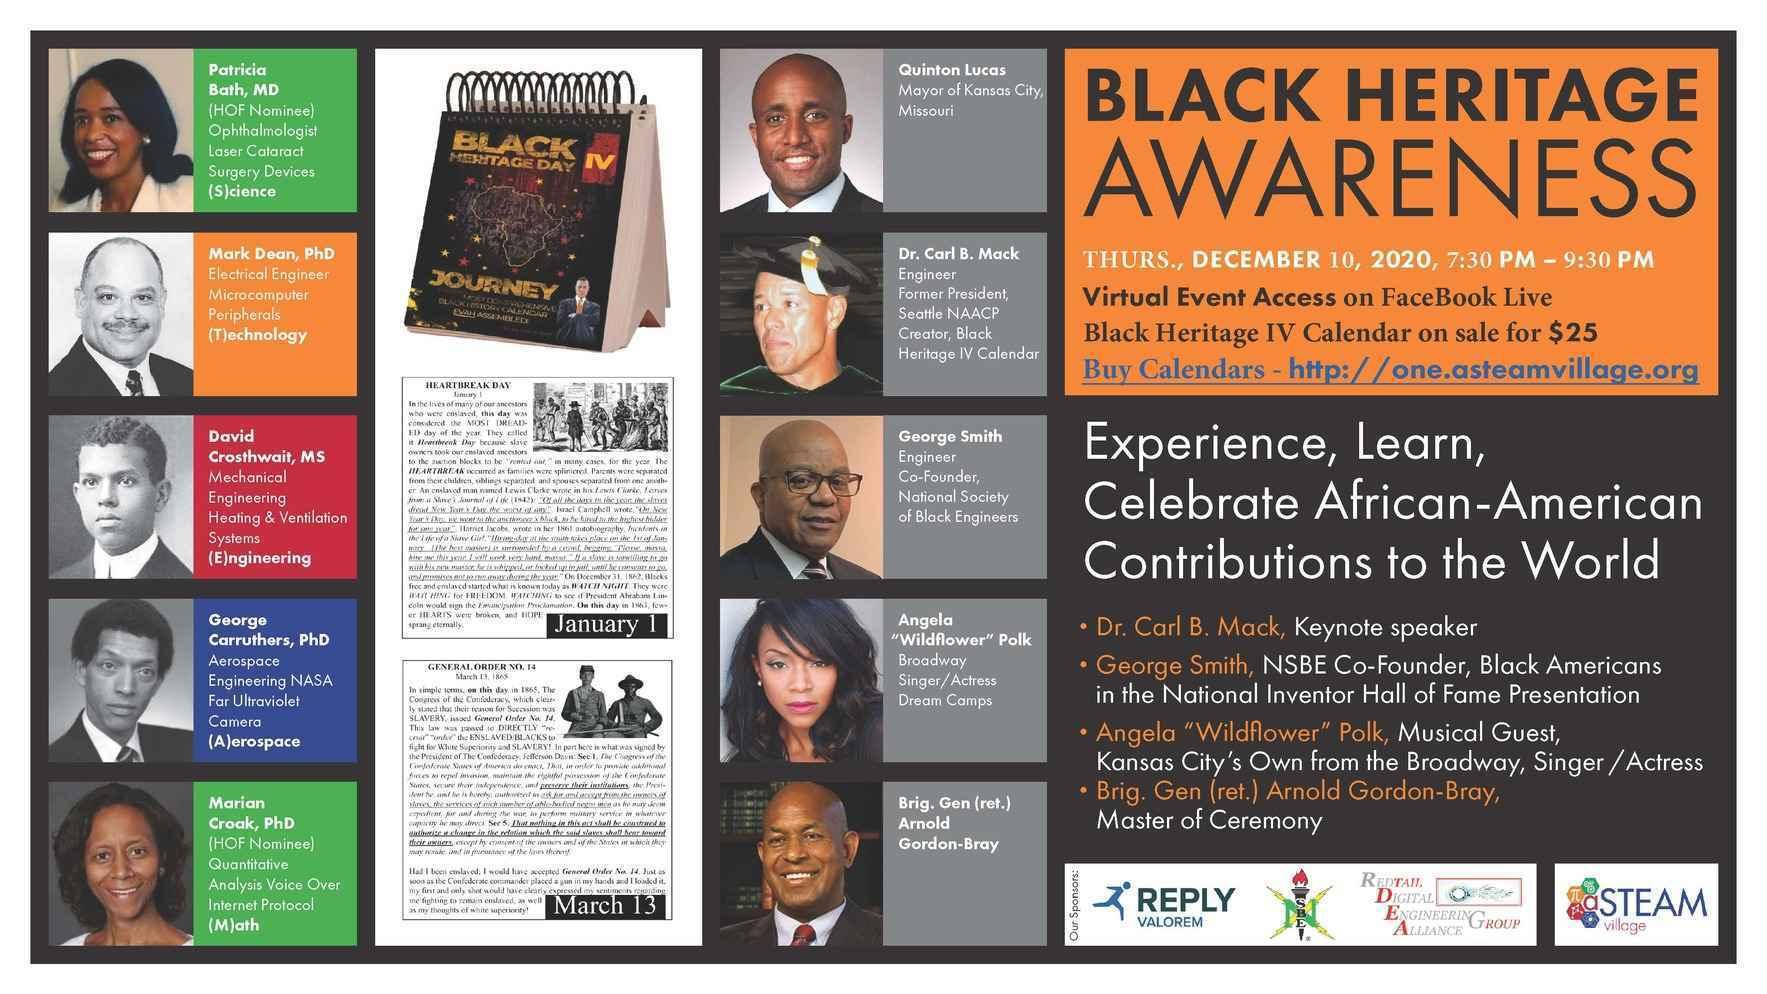 Black Heritage Awareness Calender Fundraiser image